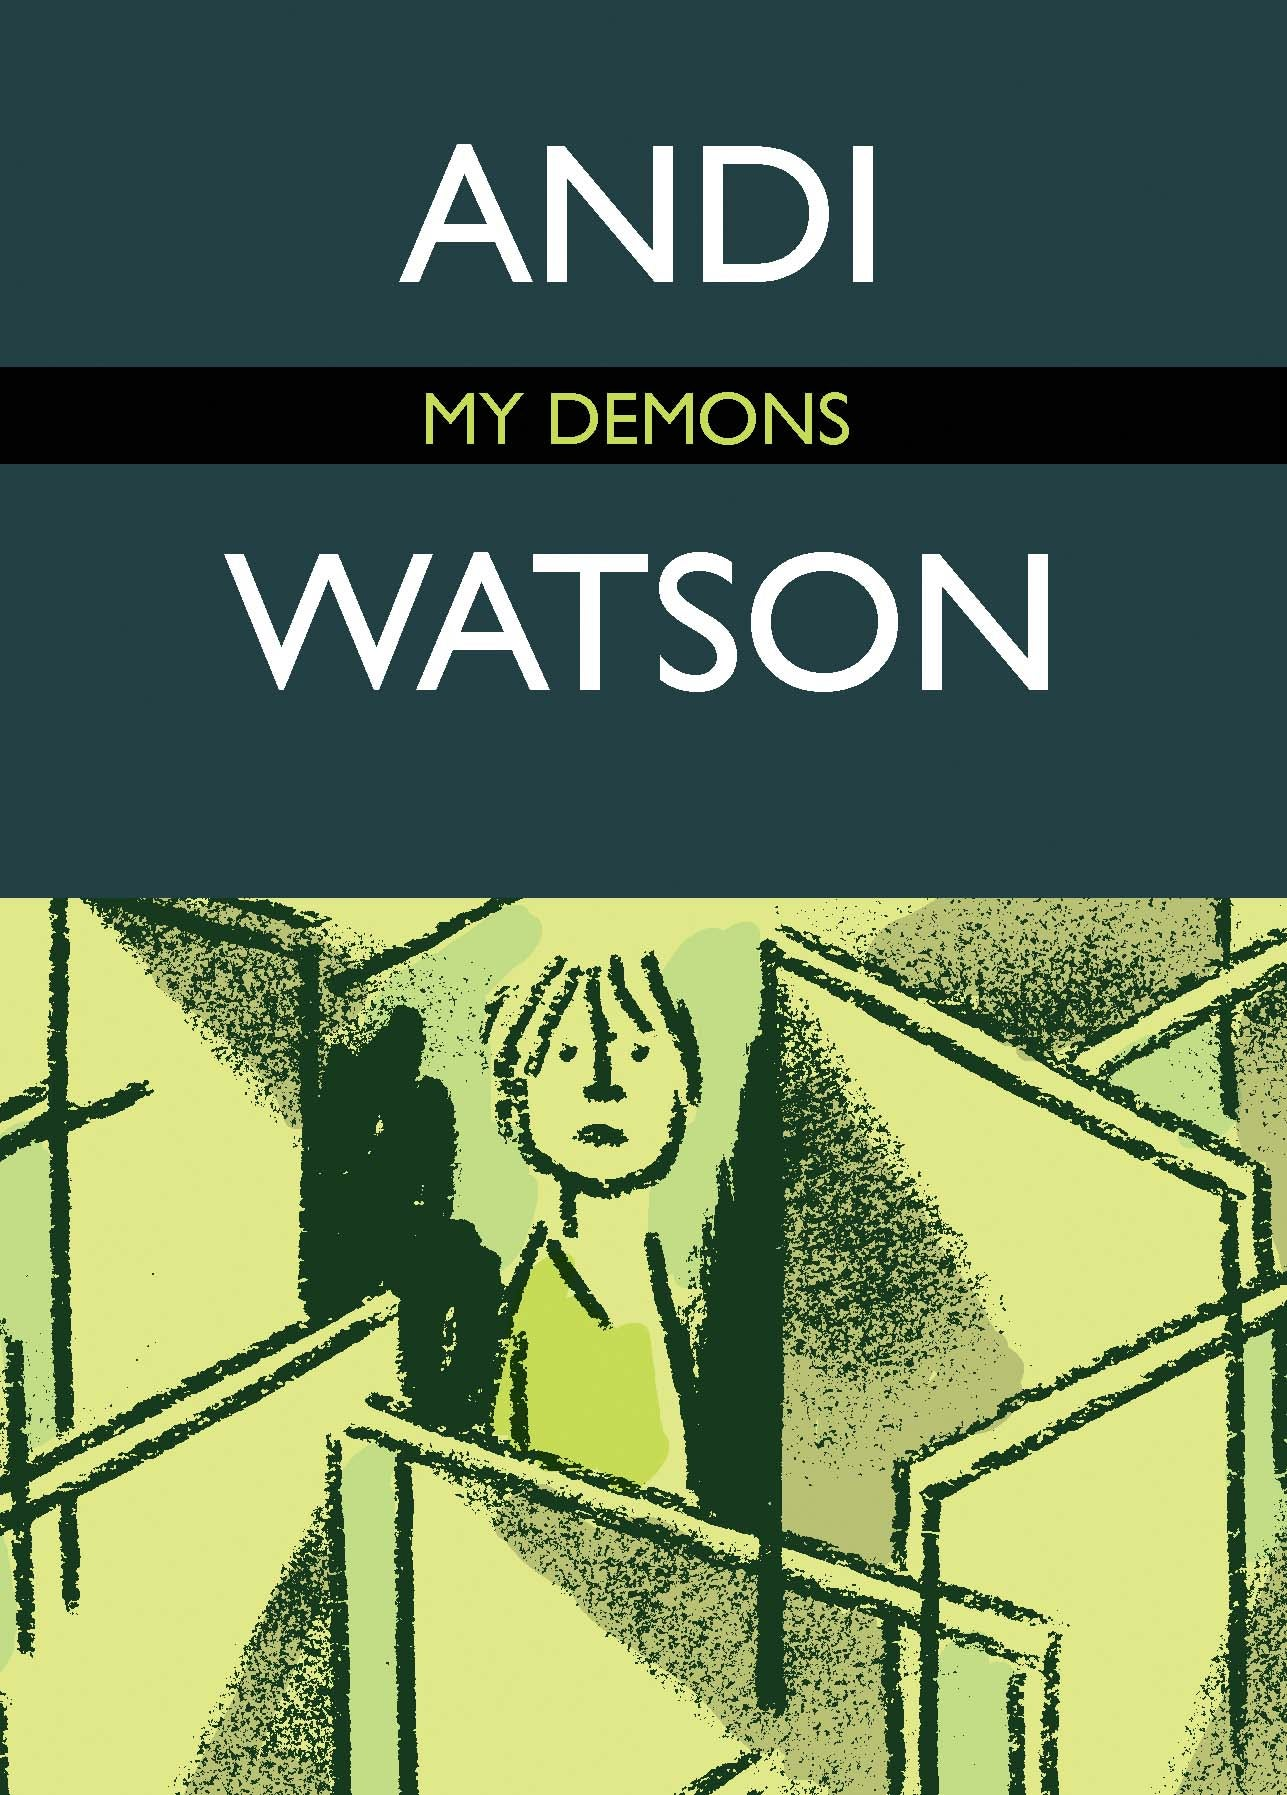 Image of My Demons mini comic